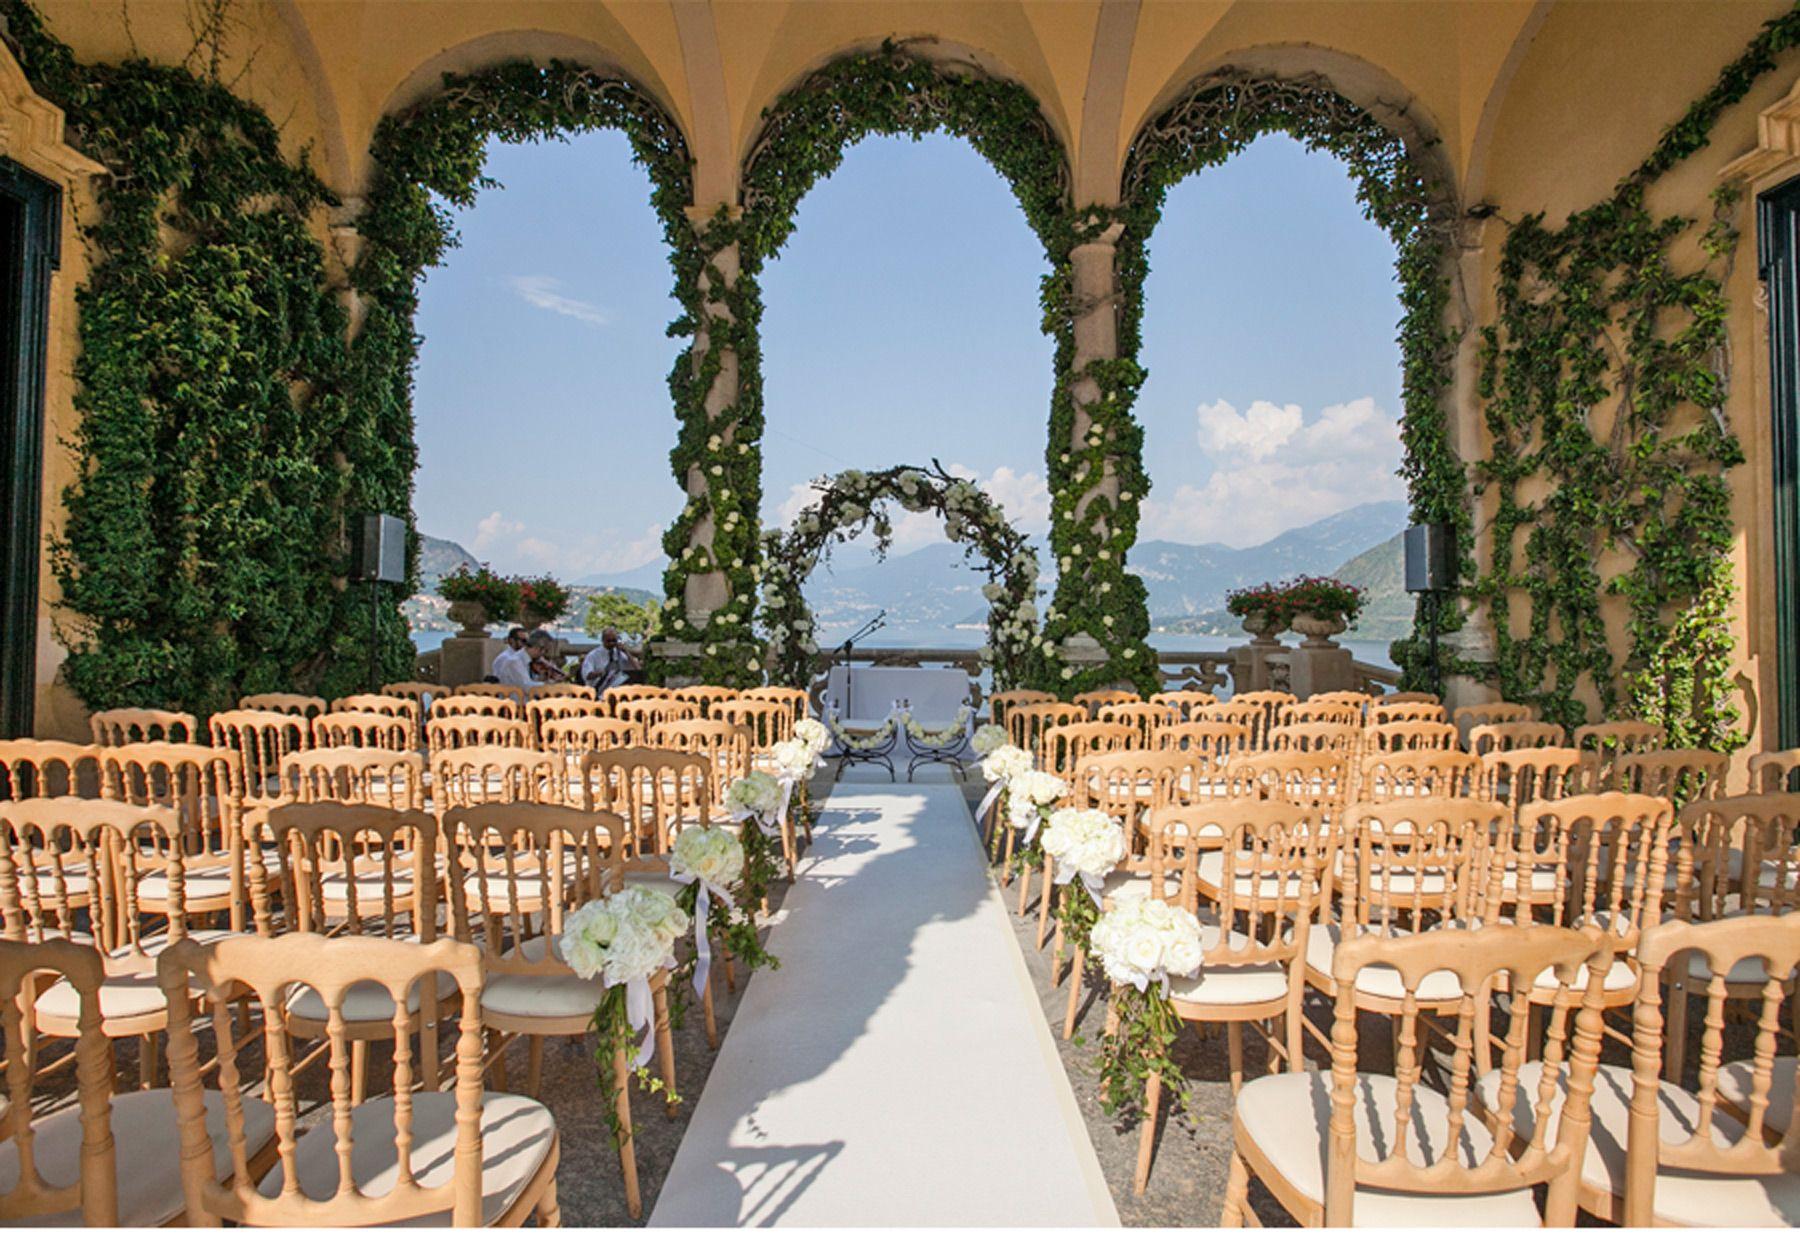 Best 25+ Lake Como Wedding Ideas On Pinterest | Lake Como Villas Wedding Venues Italy And ...